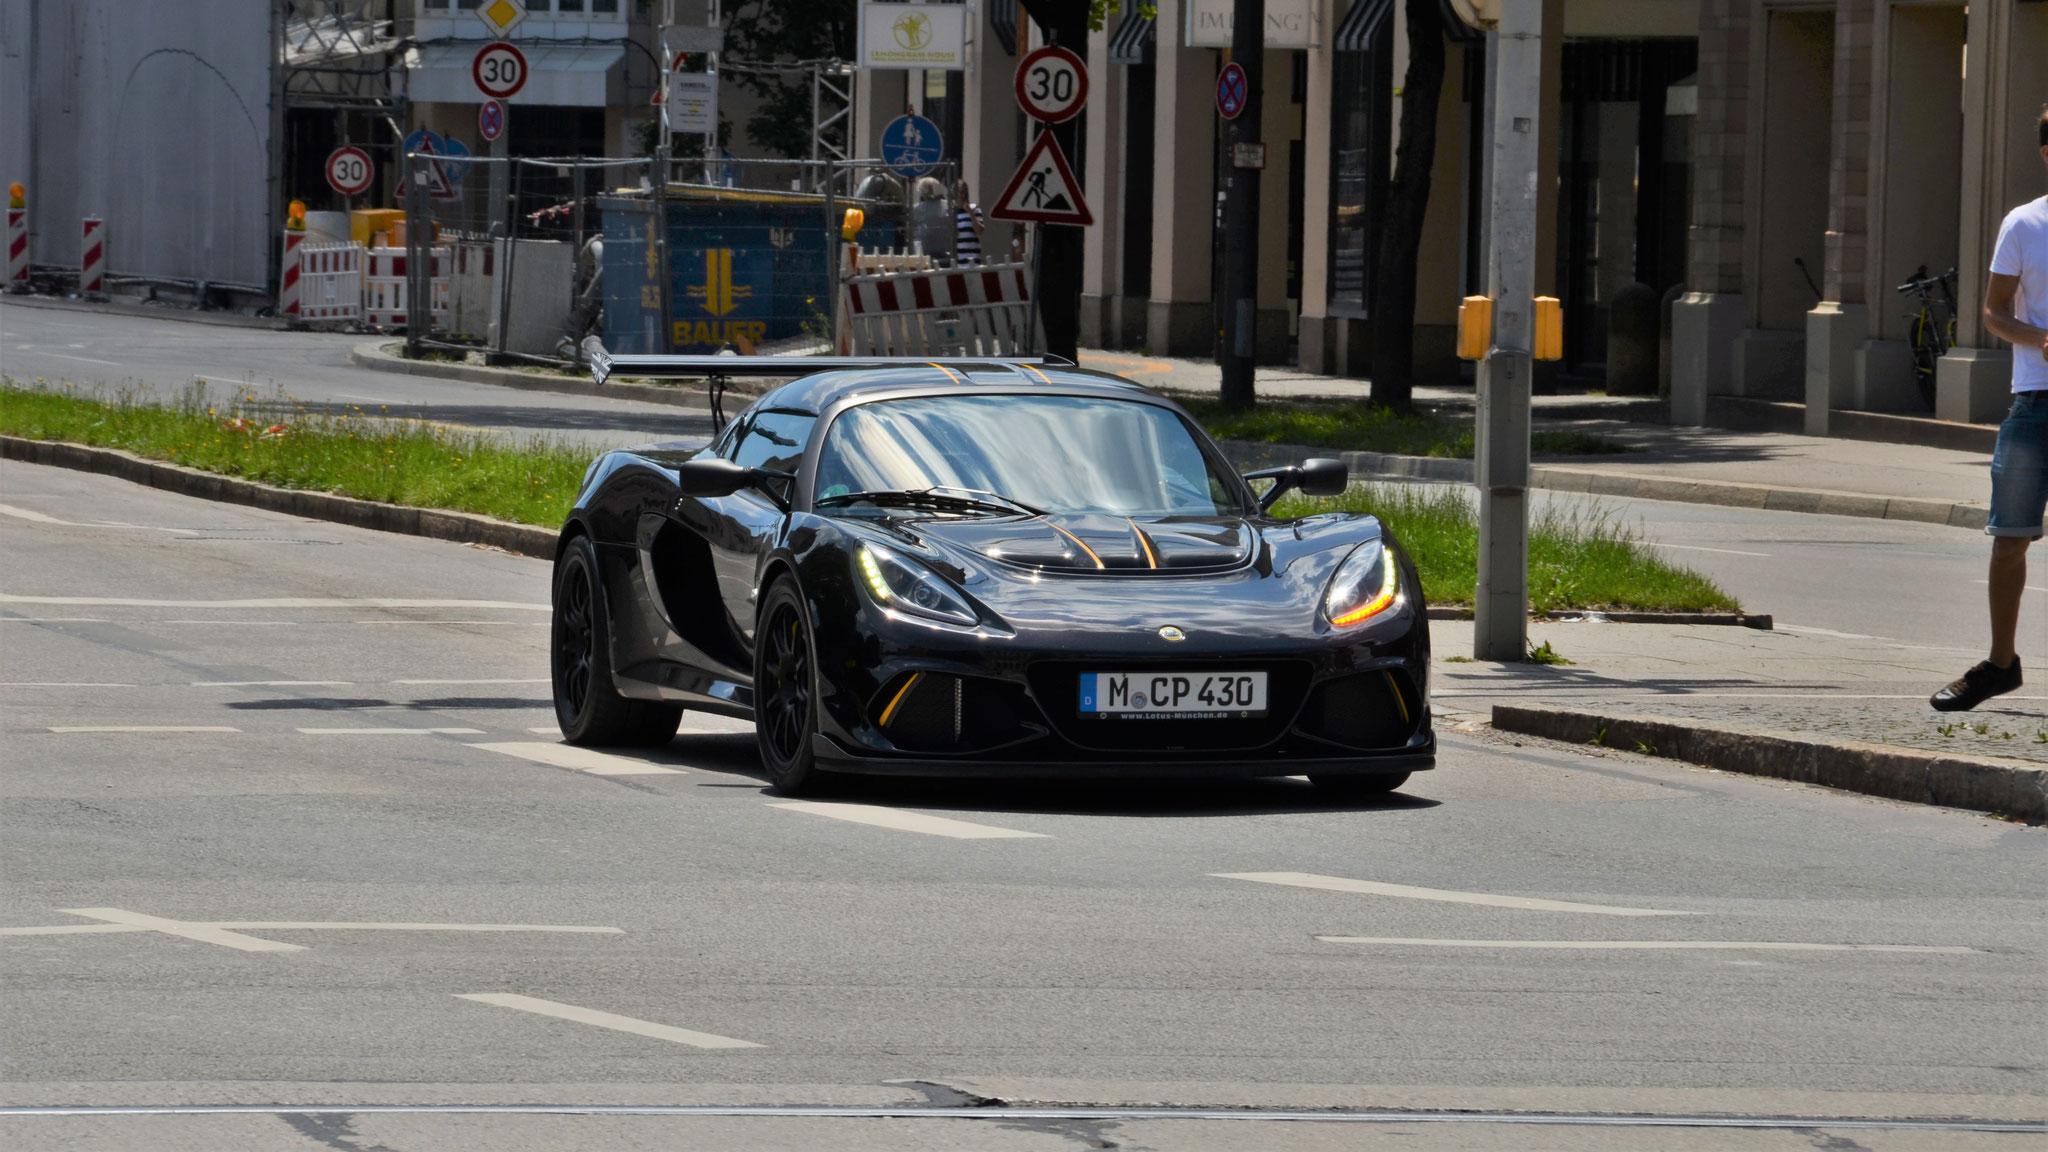 Lotus Exige 430 Cup - M-CP-430